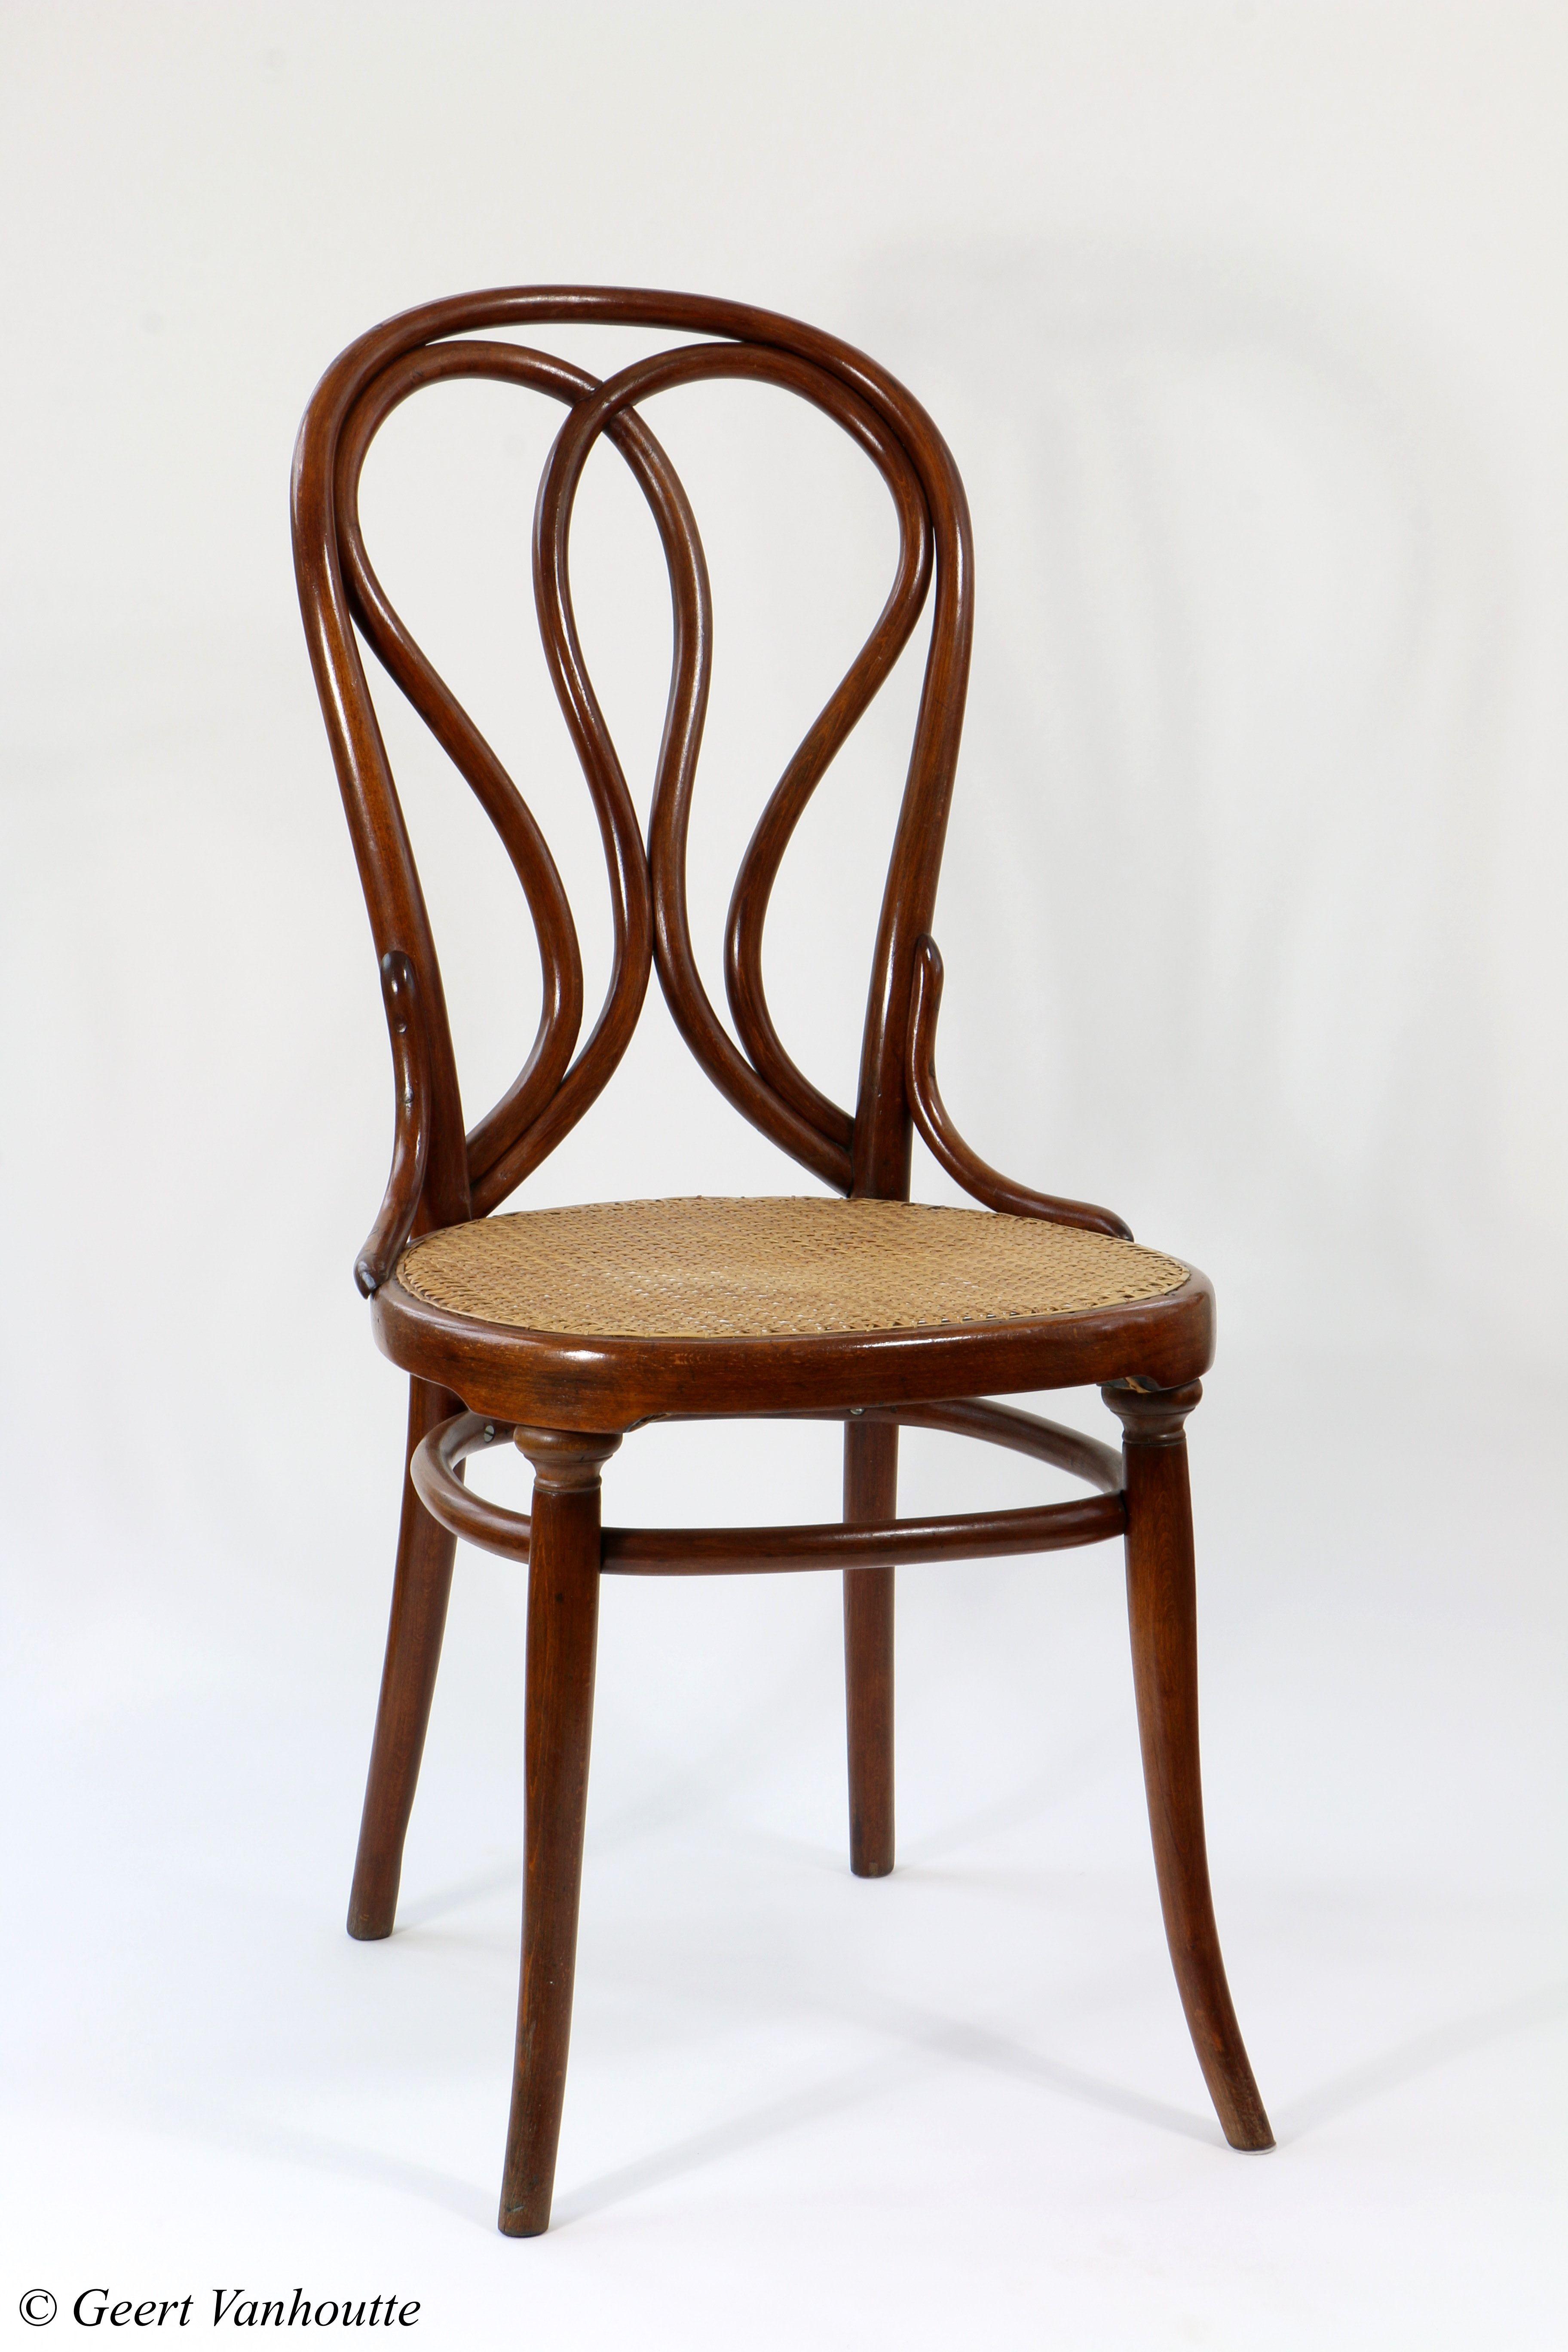 Thonet Sessel Nr 24 Gefertigt Ca 1876 1881 Mit Grosse